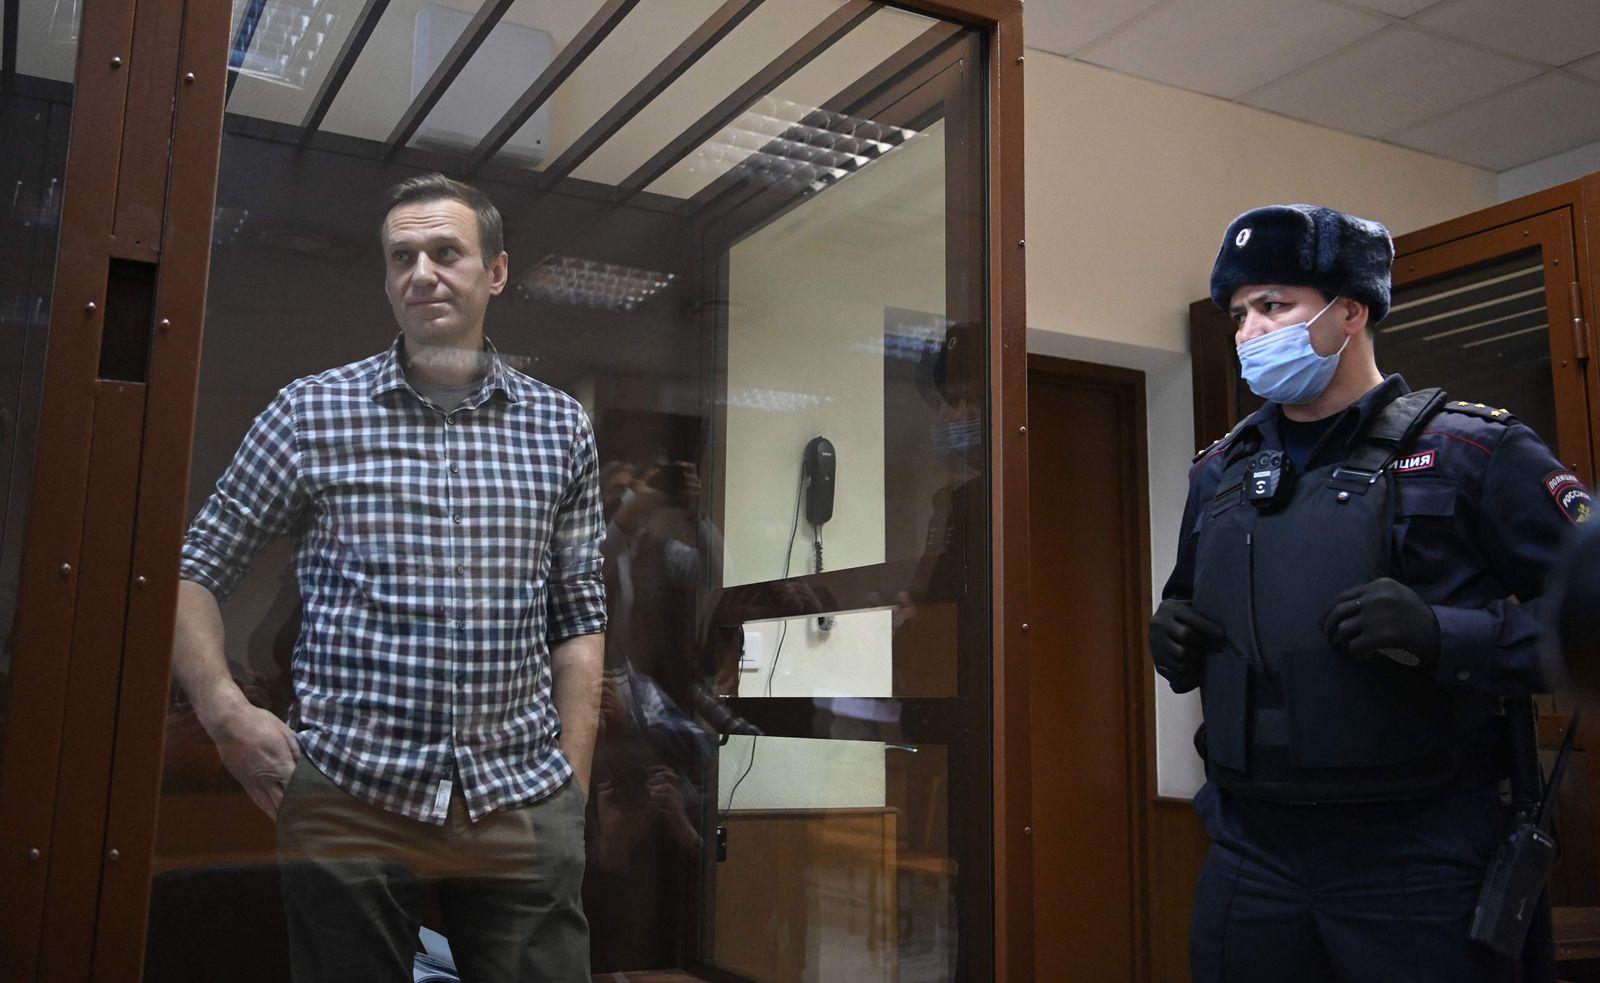 FILES-RUSSIA-POLITICS-OPPOSUTION-NAVALNY